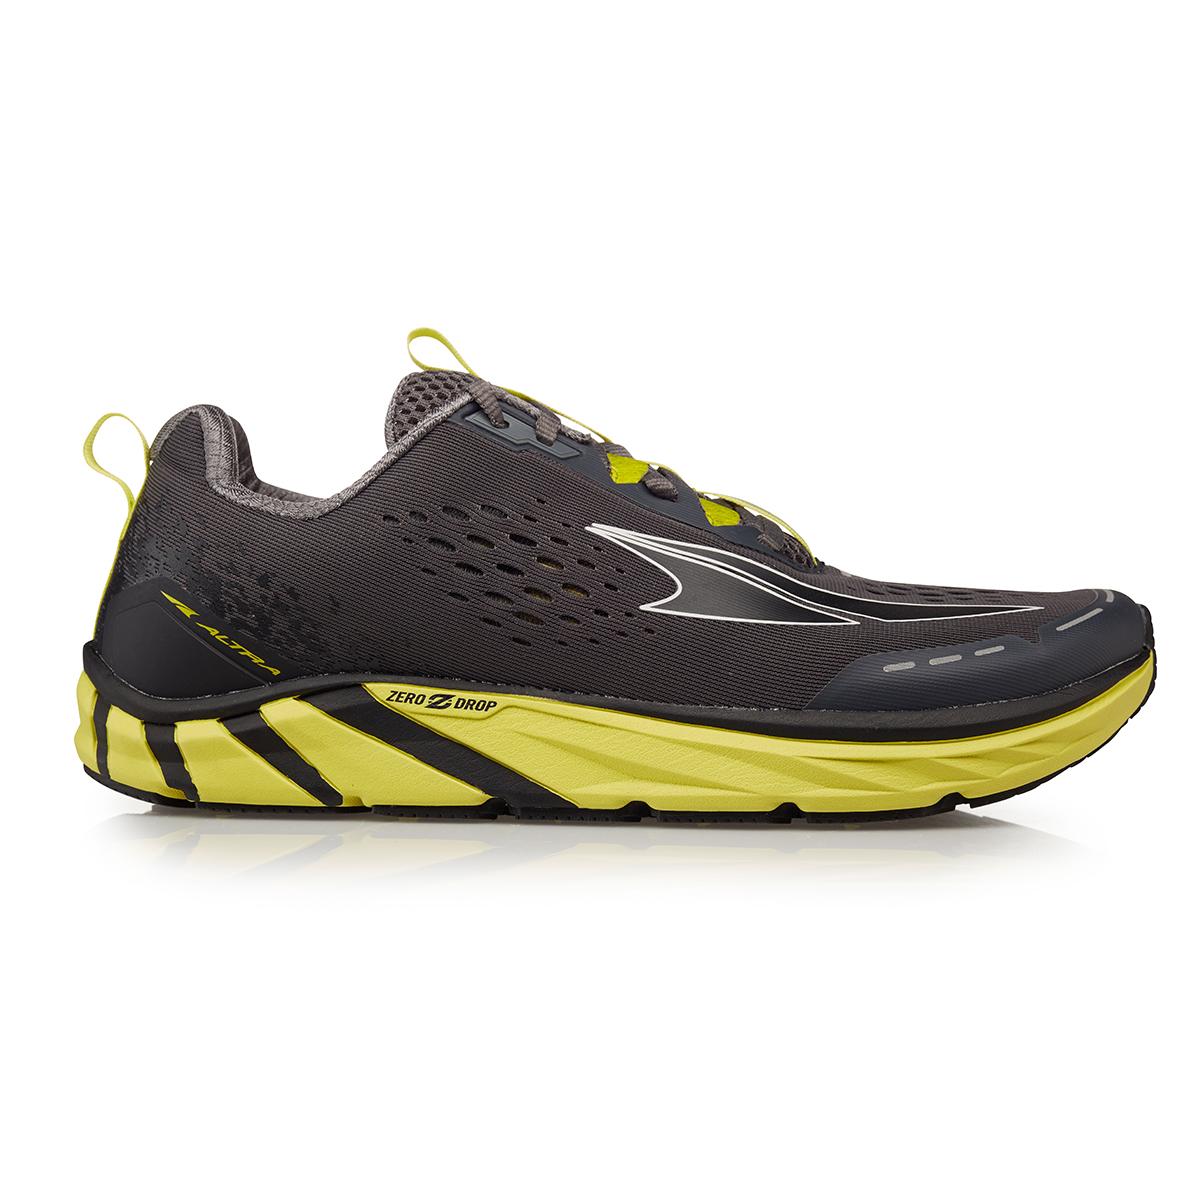 Men's Altra Torin 4 Running Shoe - Color: Gray/Lime - Size: 7 - Width: Regular, Gray/Lime, large, image 1